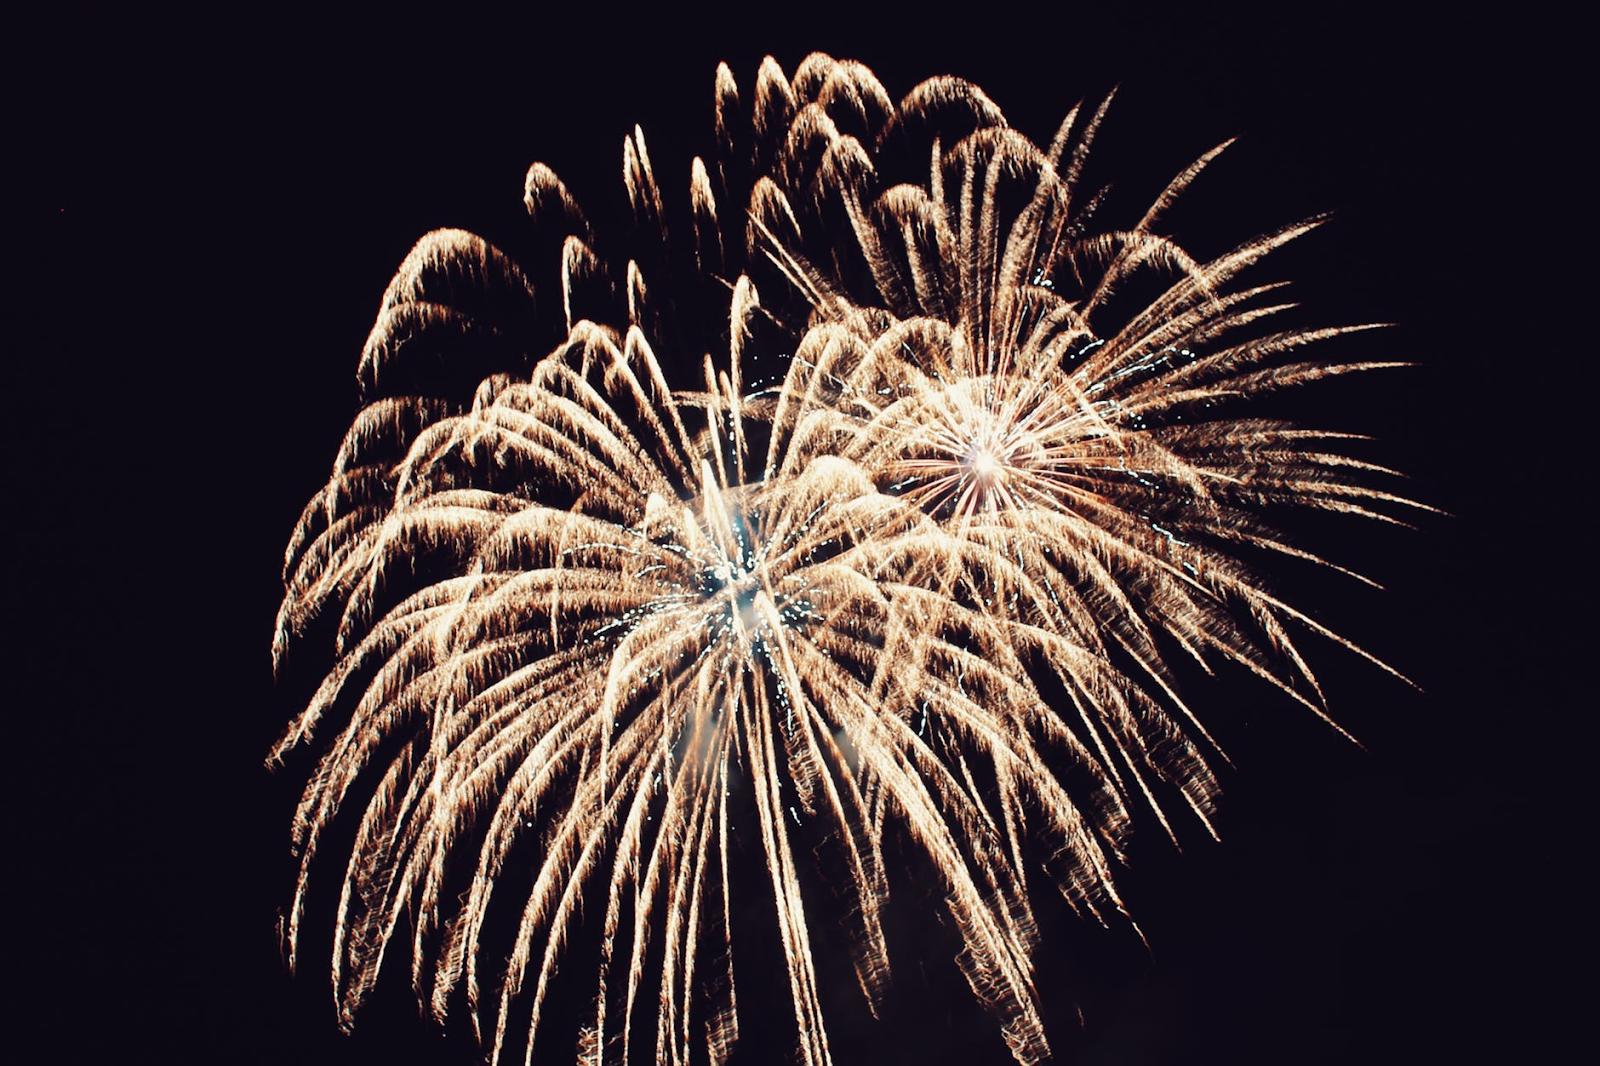 Bright gold fireworks